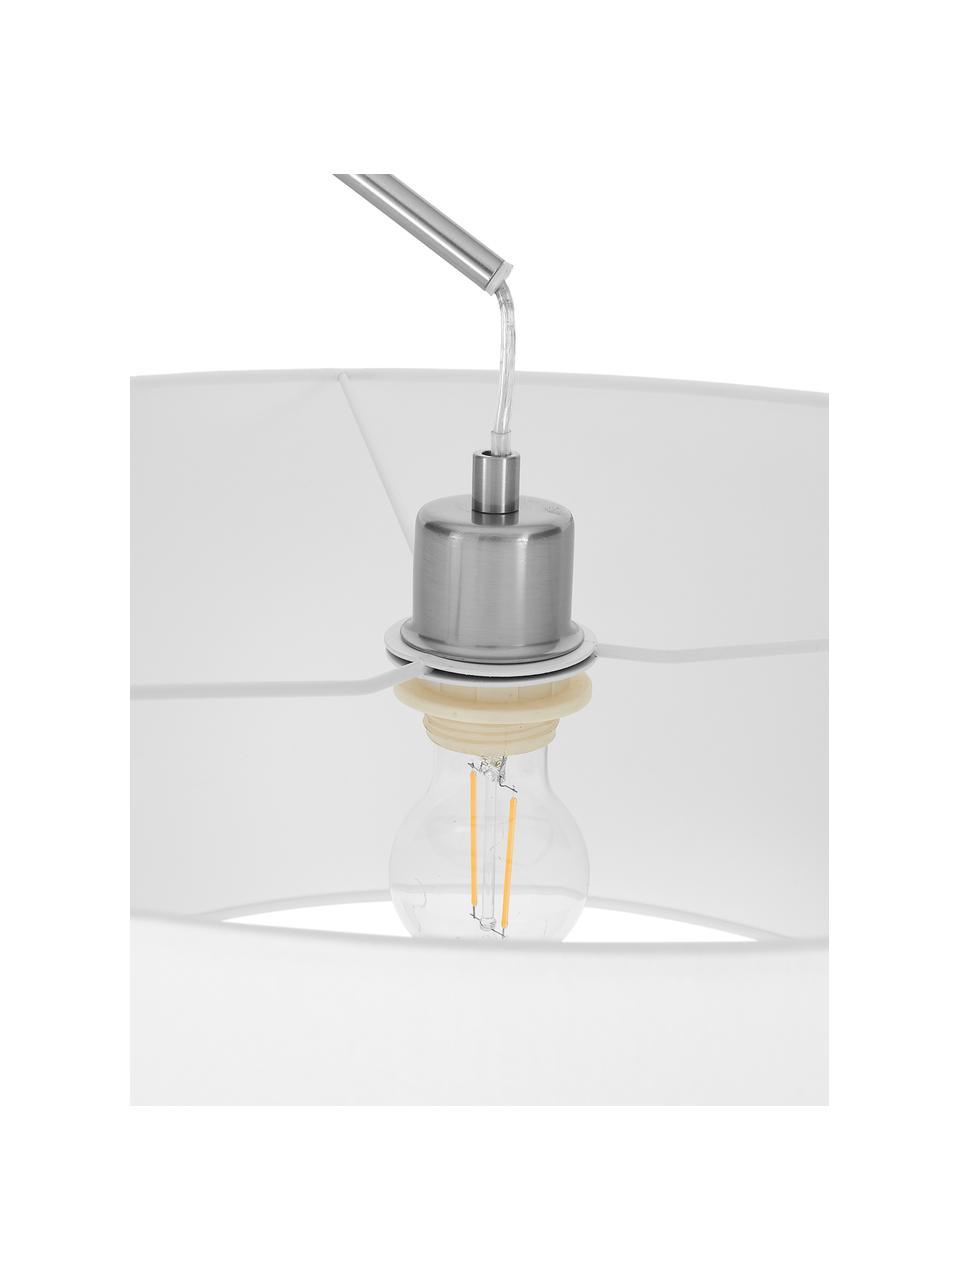 Grand lampadaire arc moderne Niels, Blanc, chrome, transparent